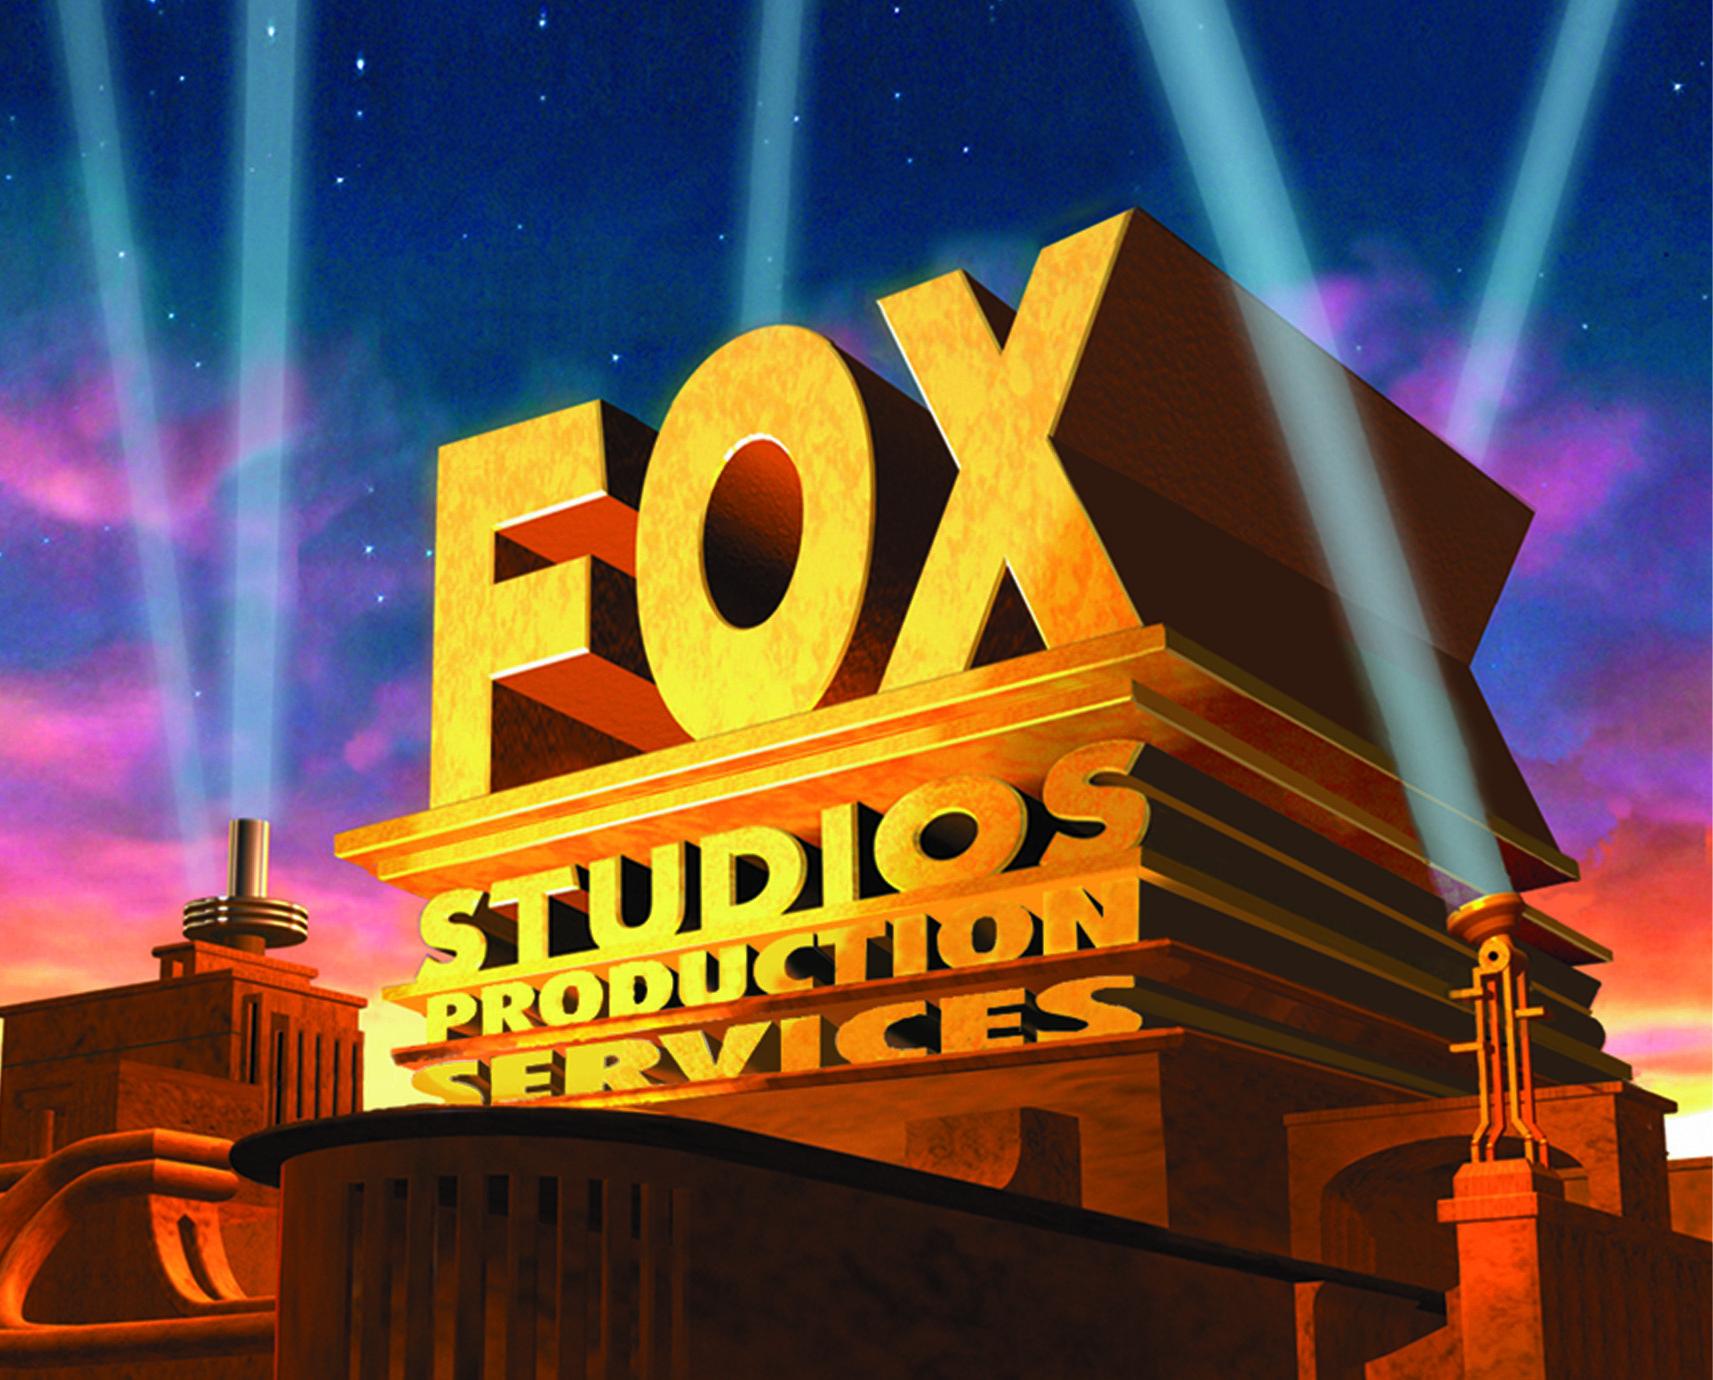 fow studios